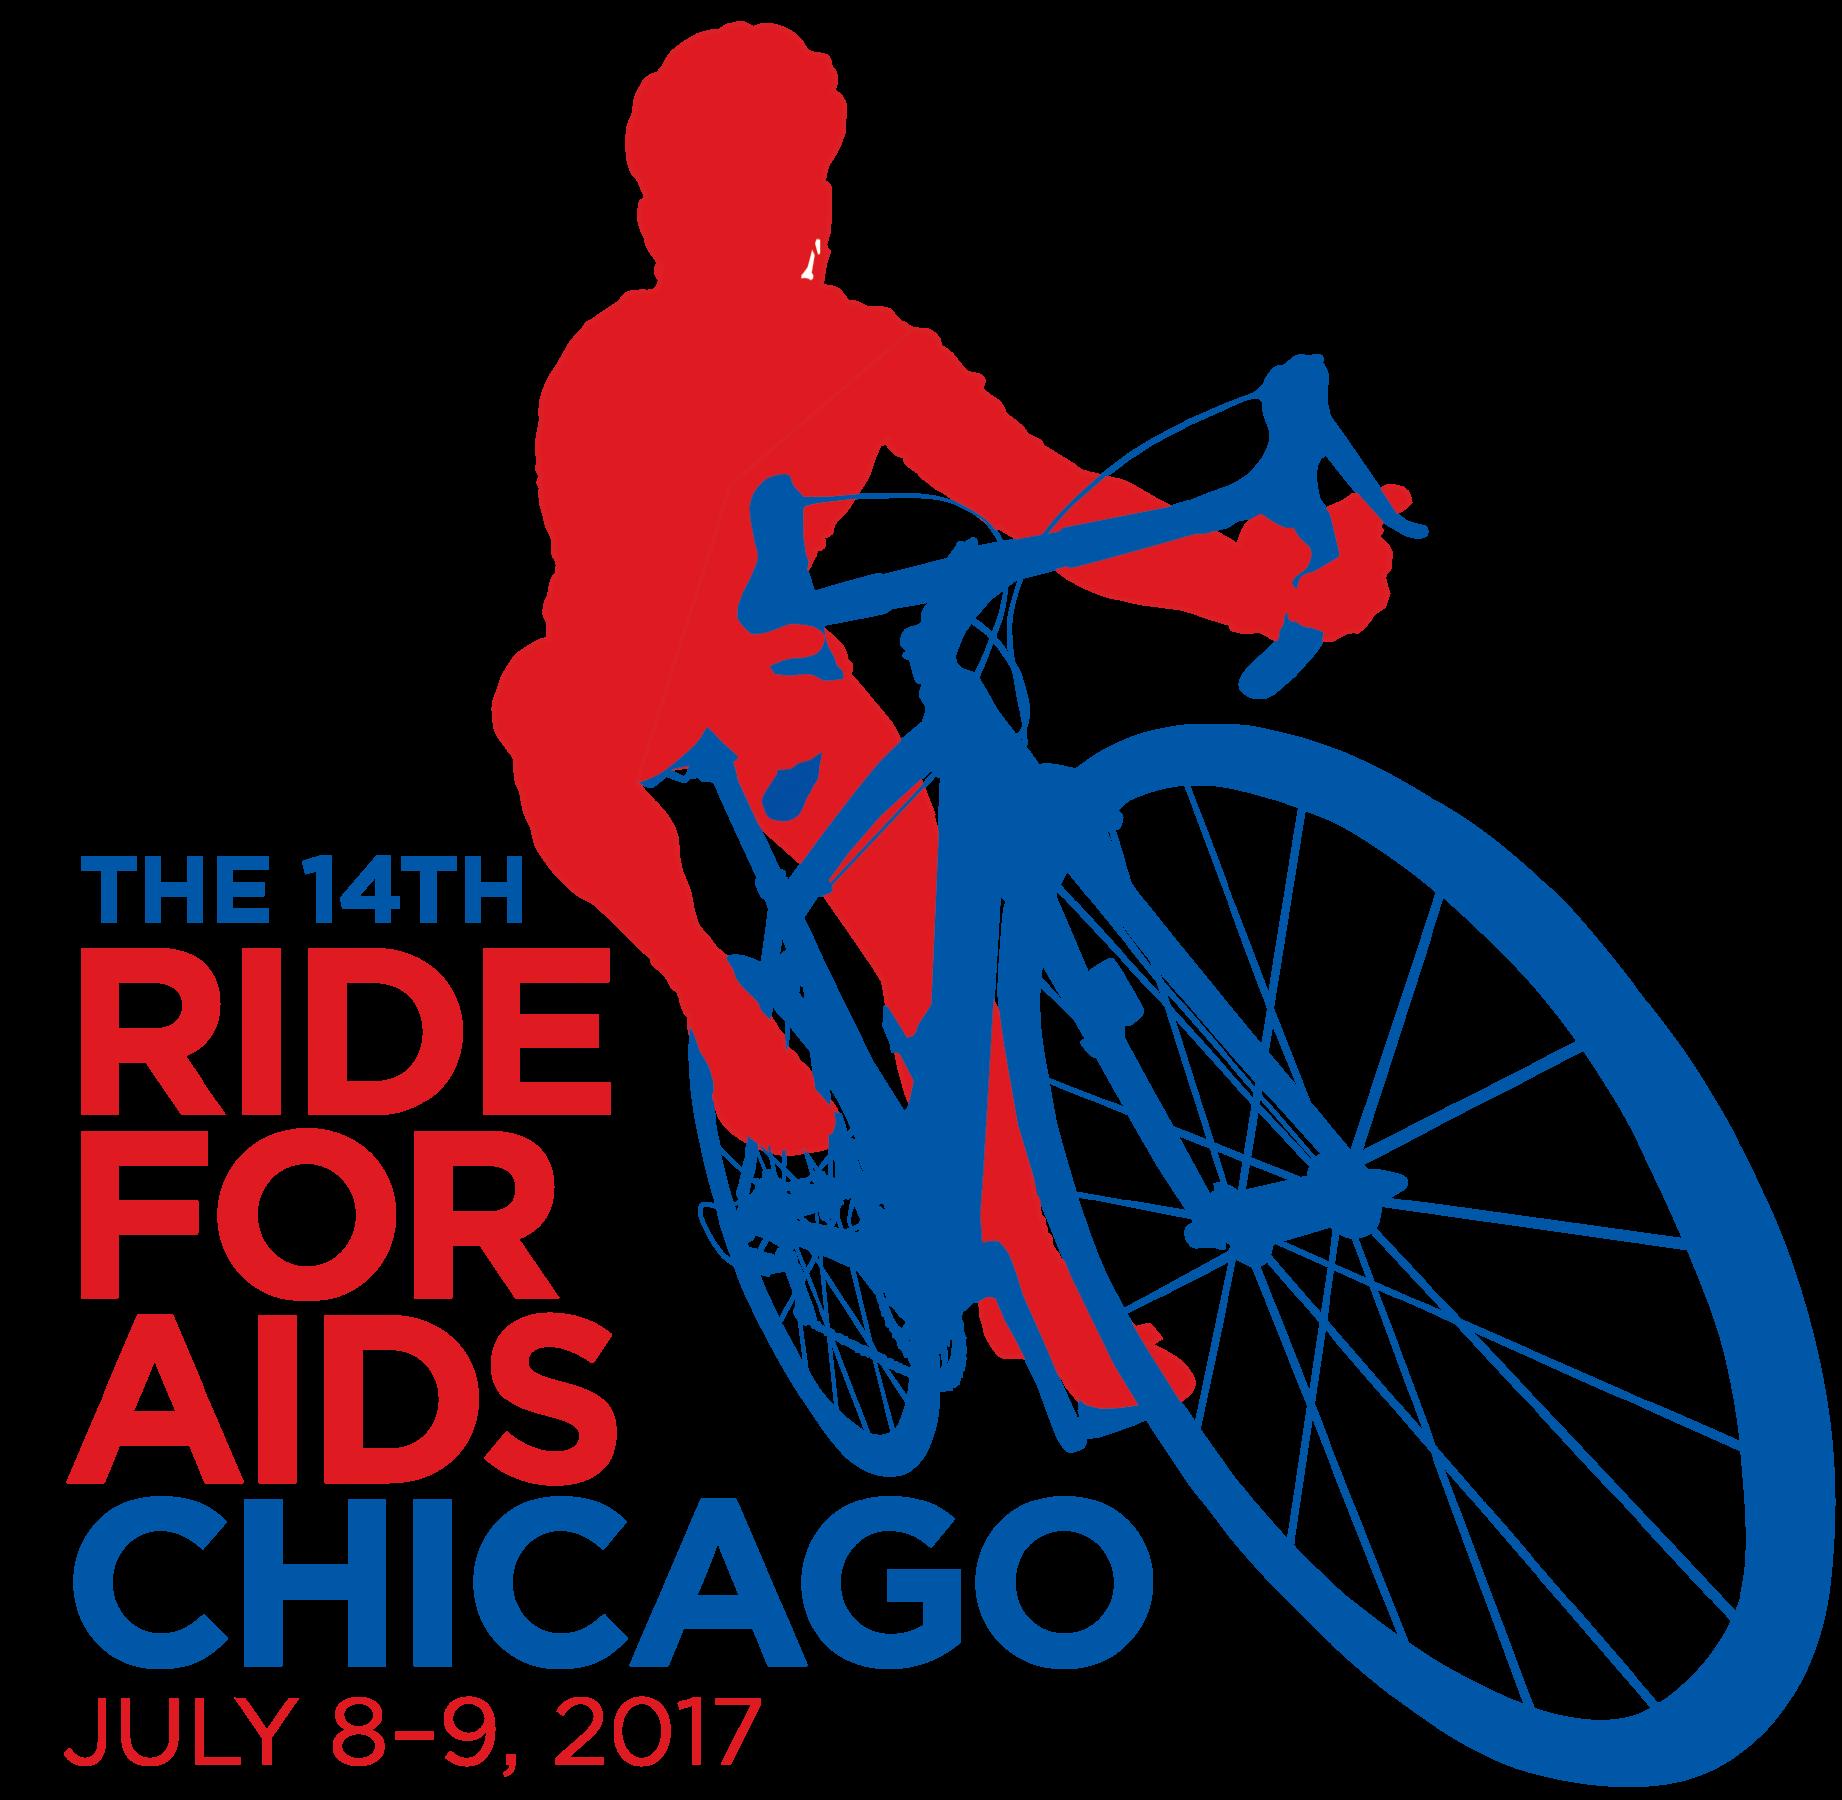 TPAN Announces 14th Annual Ride for AIDS Chicago  8fb220a85